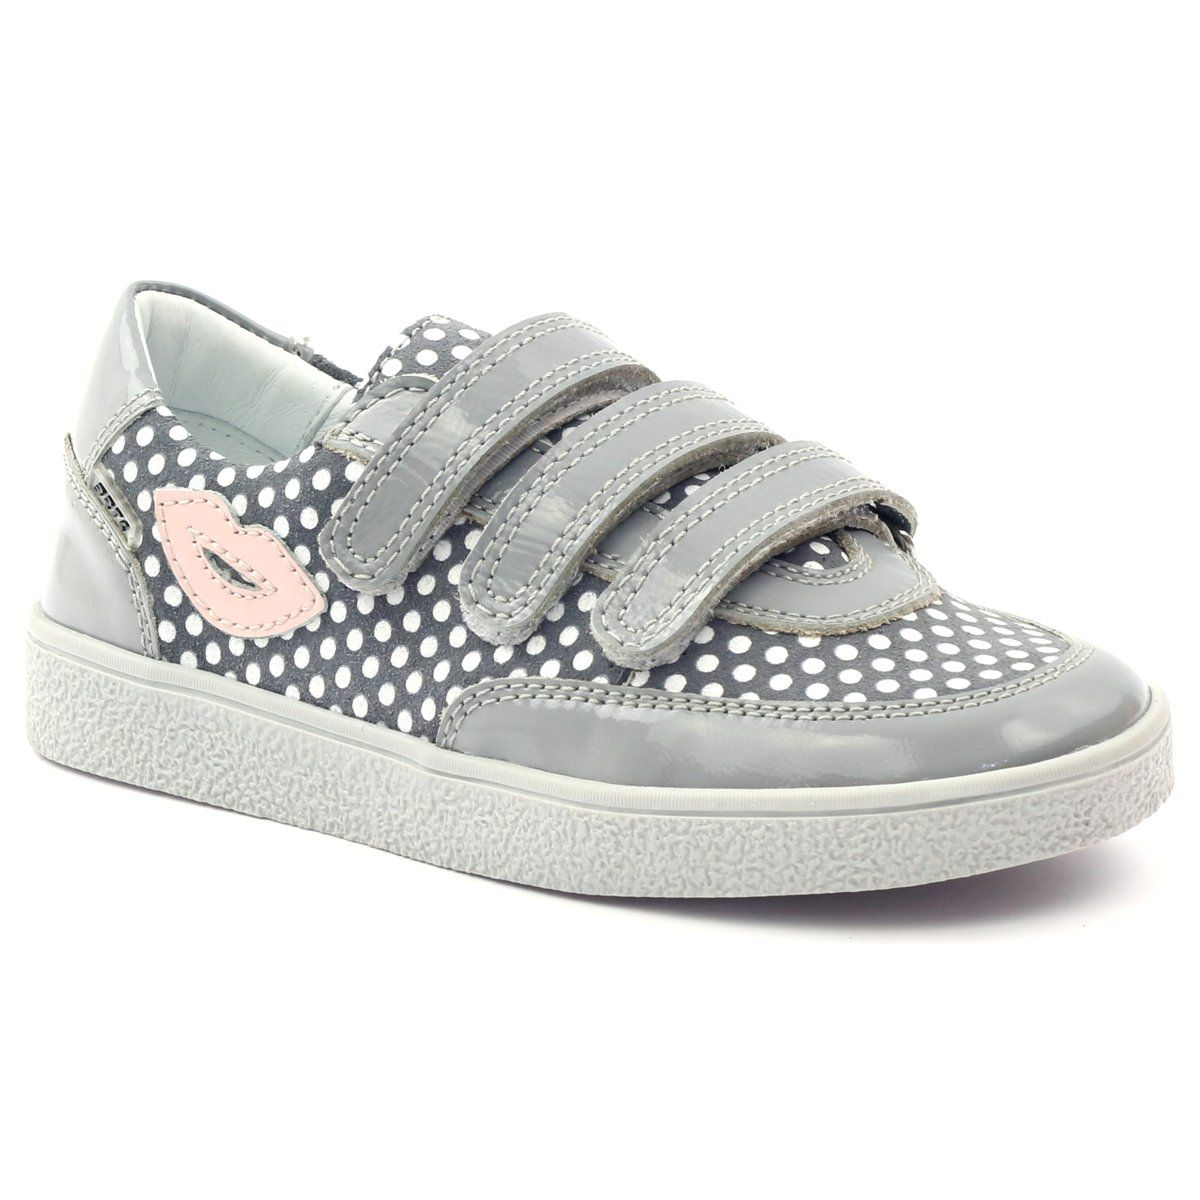 Bartek Buty Na Rzepy Szare W Kropki 35651 Rozowe Biale Kid Shoes Childrens Shoes Girls Shoes